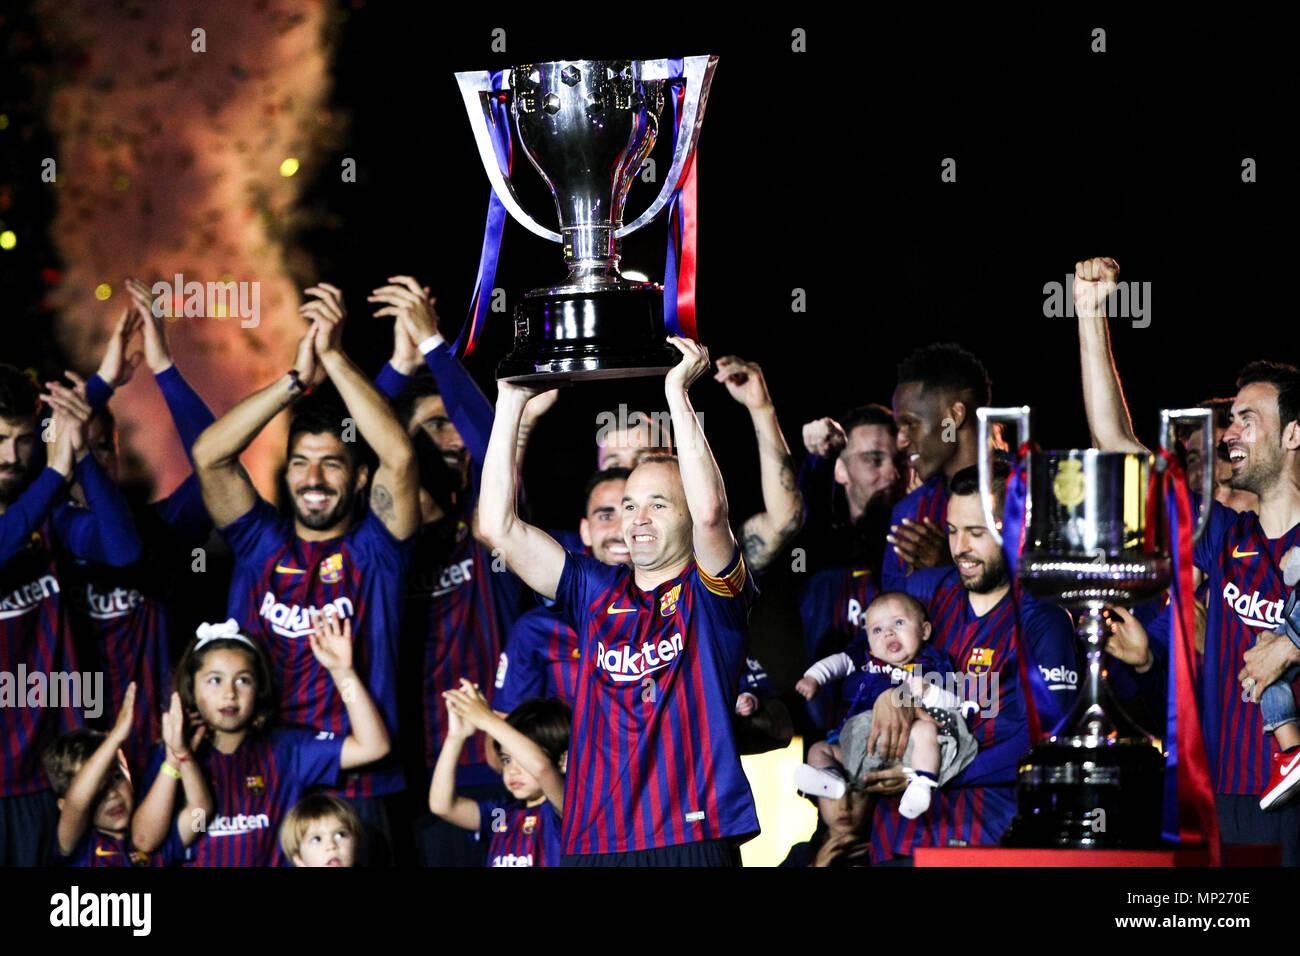 Camp Nou, Barcelona, Spain. 20th May, 2018. La Liga football, Barcelona versus Real Sociedad; Andres Iniesta of FC Barcelona with La Liga trophy Credit: Action Plus Sports/Alamy Live News Stock Photo